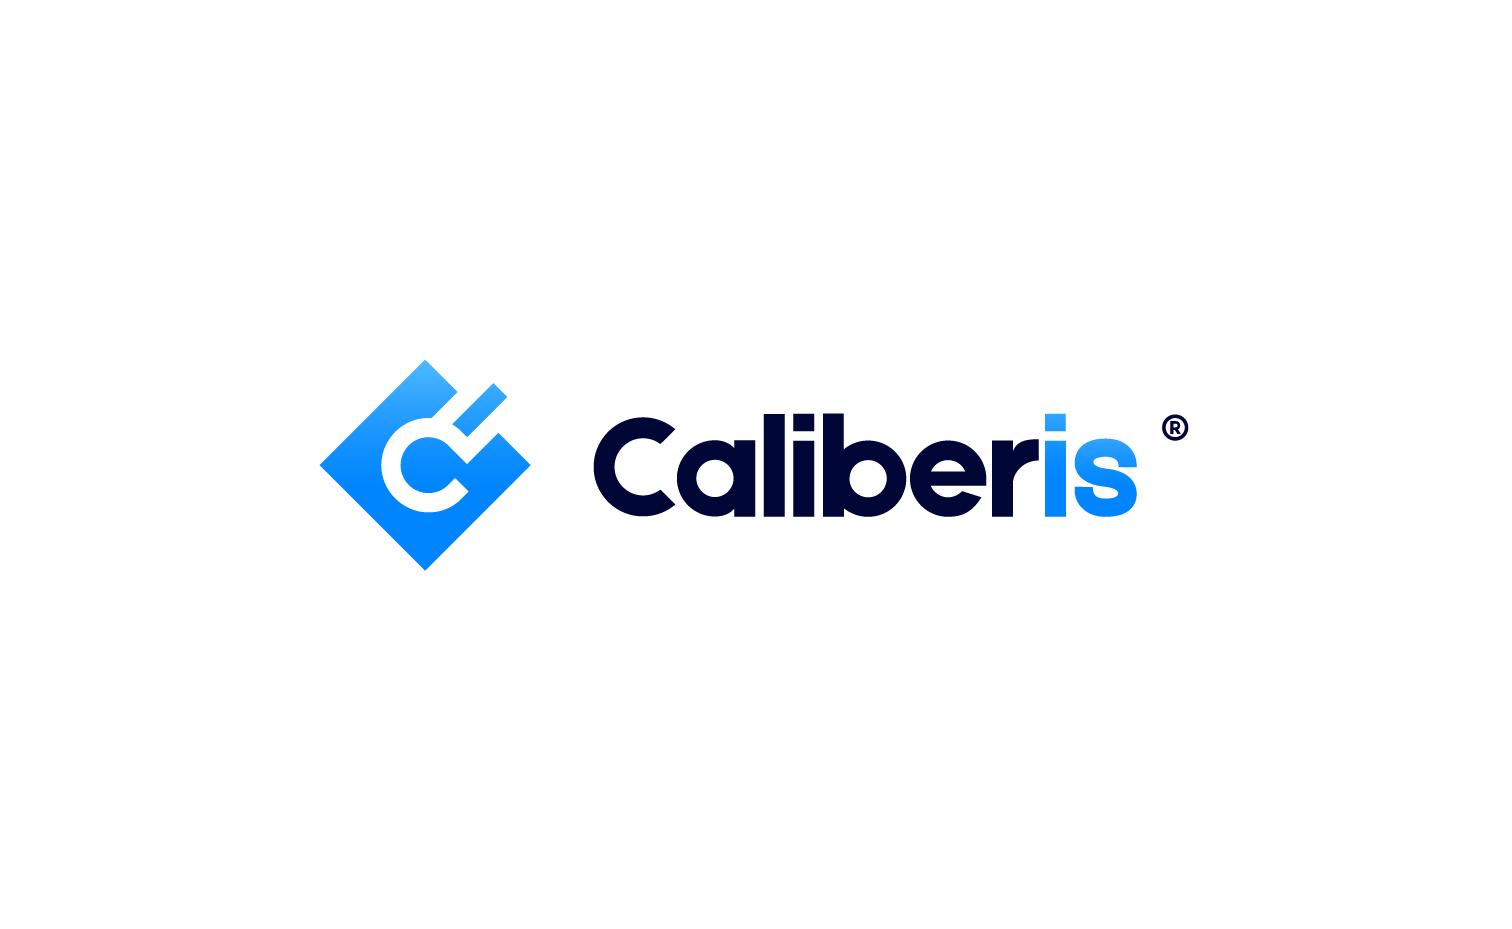 caliberis